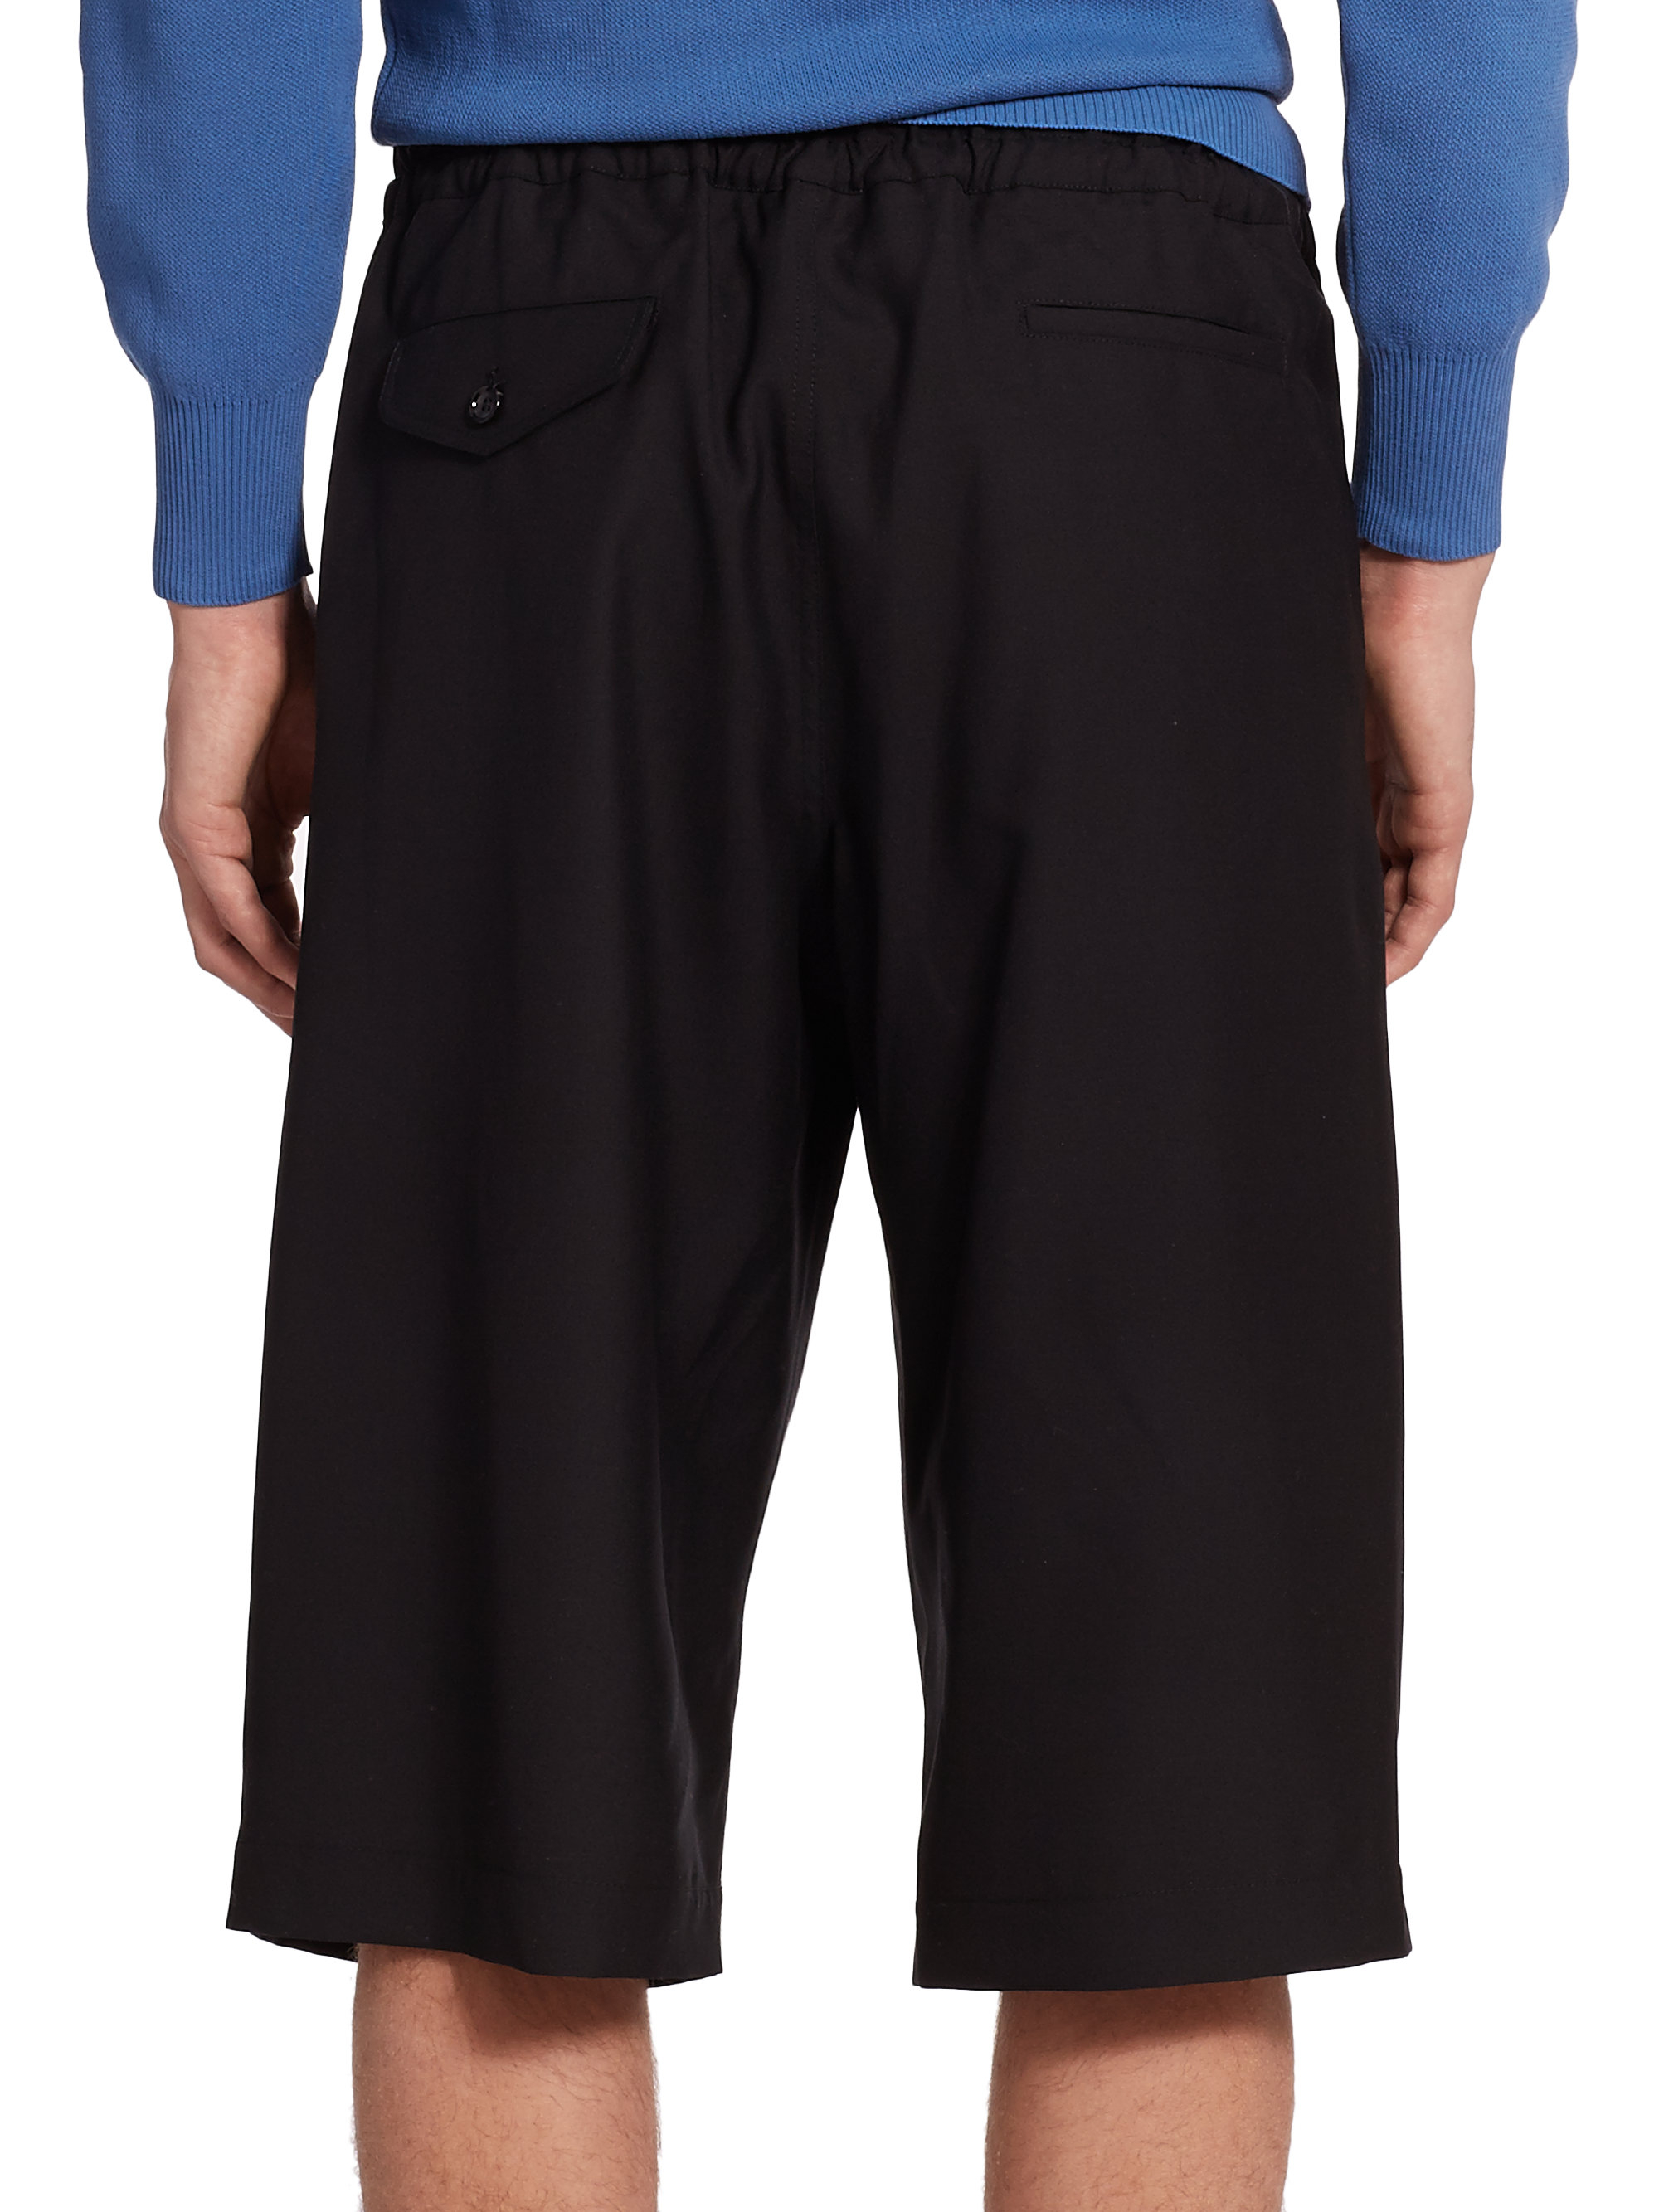 Shop Women's Skirts at newbez.ml Find pencil skirts, wool skirts, mini-skirts, denim skirts and more!